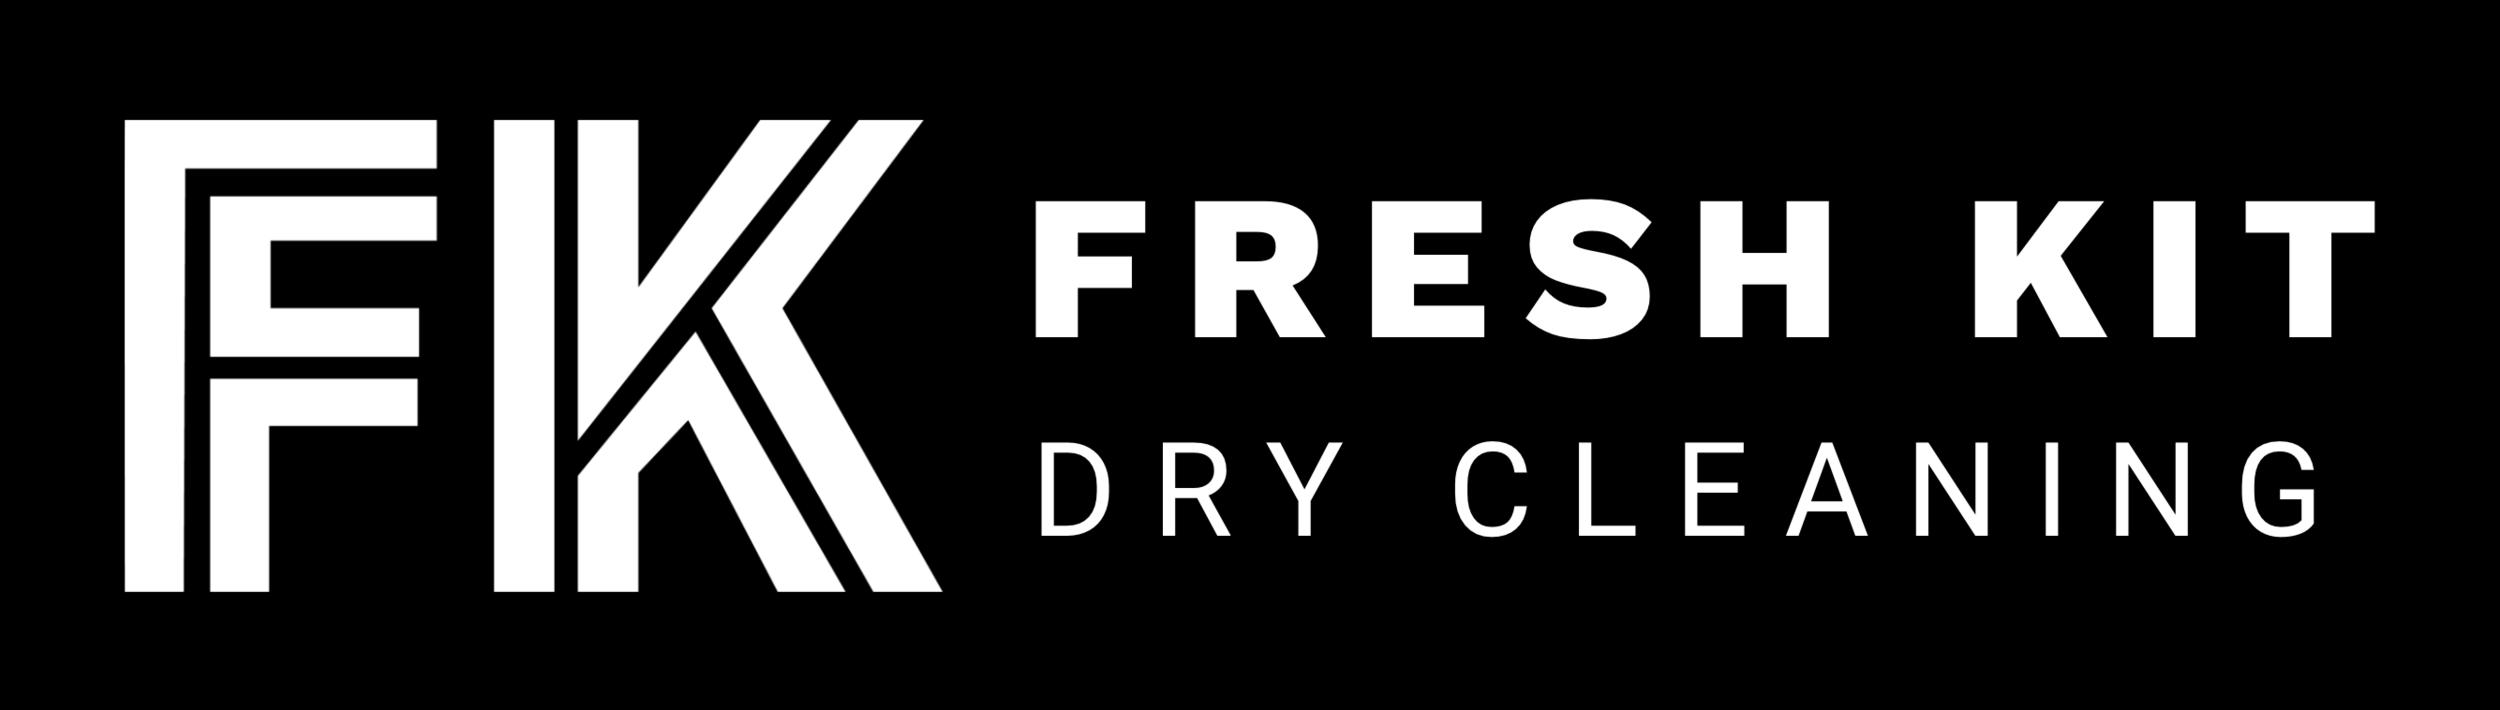 Fresh Kit - Dry Cleaning black logo